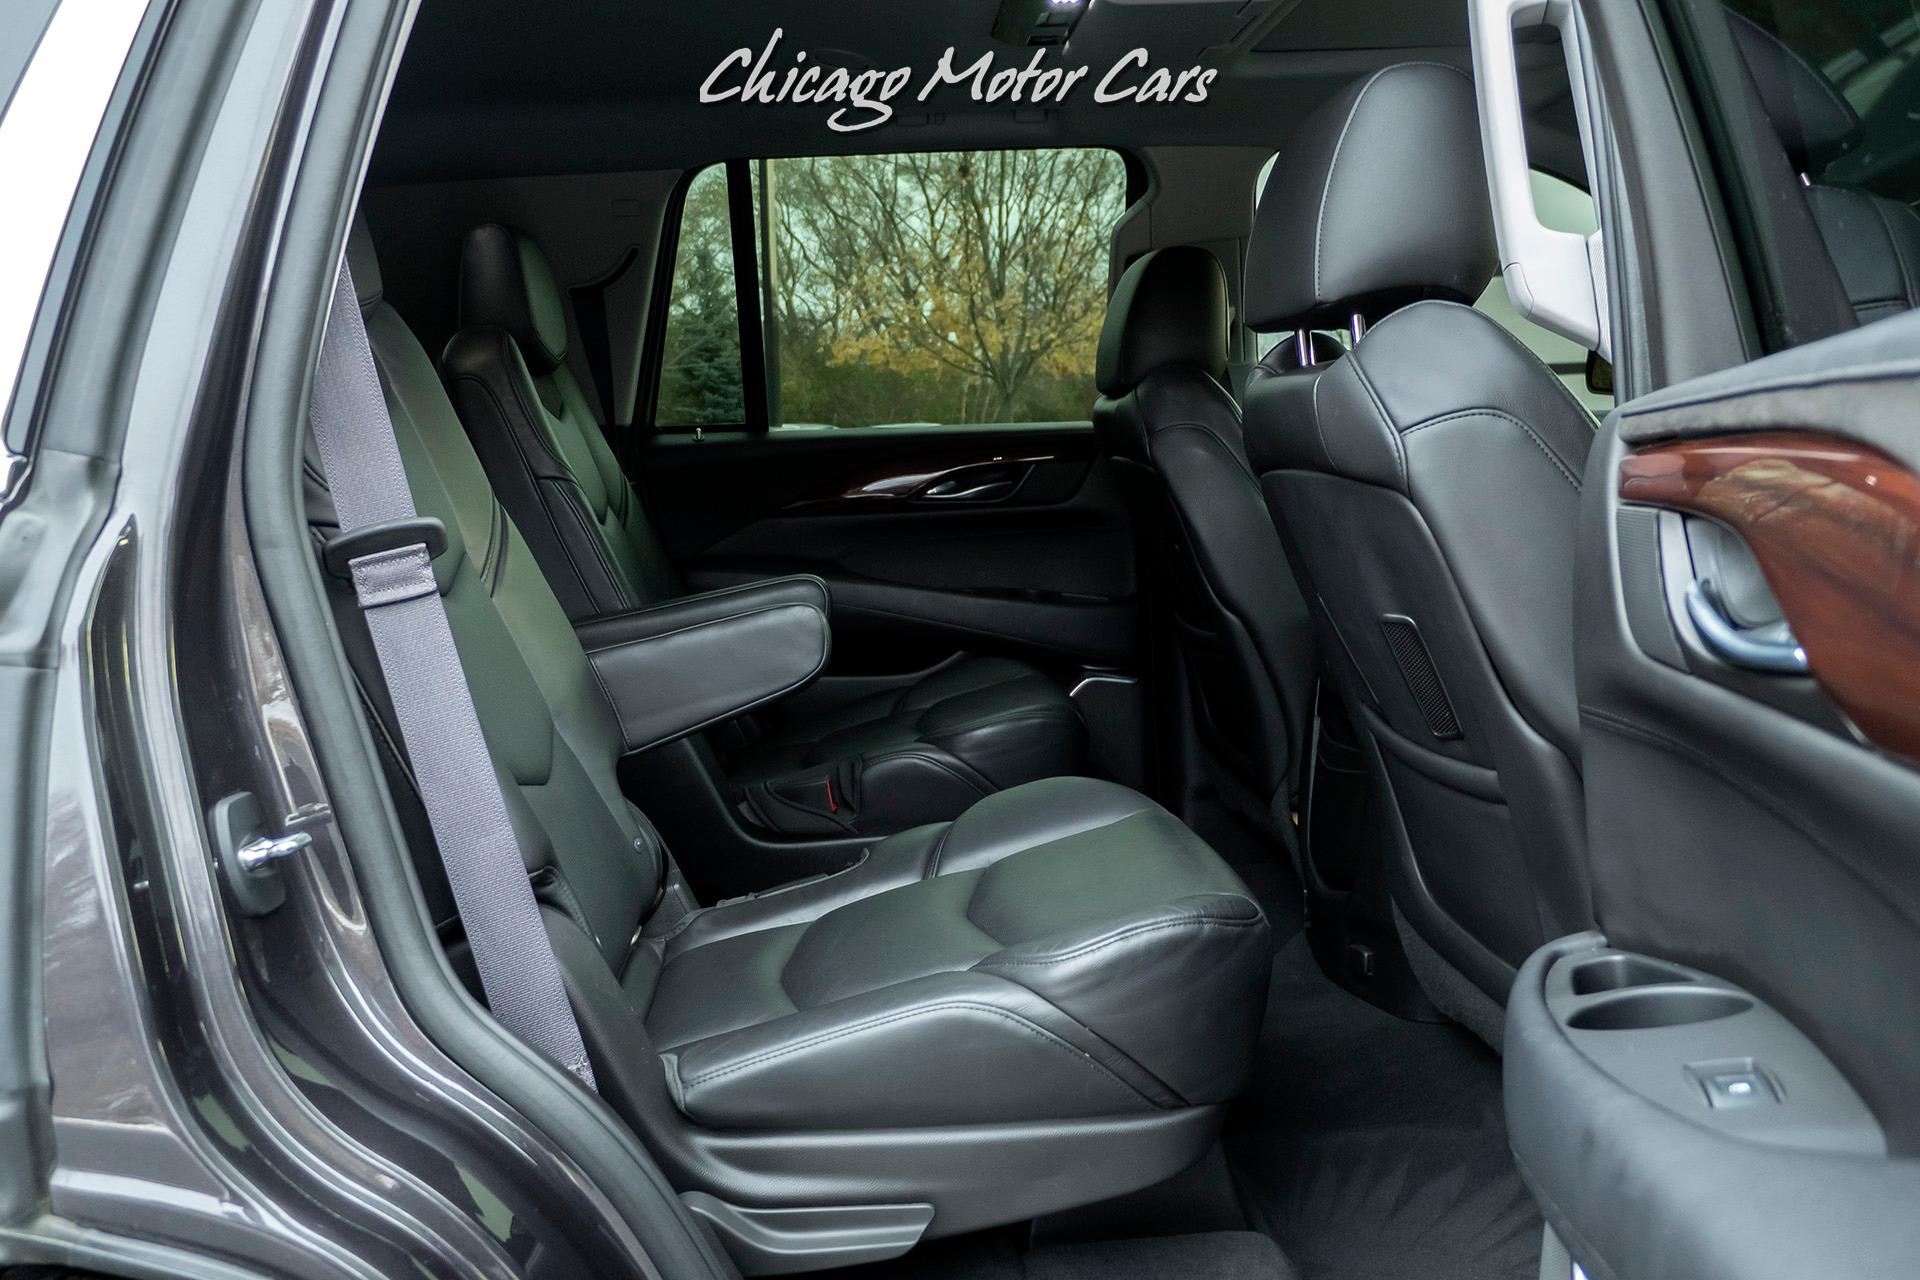 Used-2015-Cadillac-Escalade-Premium-AWD-SUV-22-Inch-Wheels-Perfect-Winter-SUV